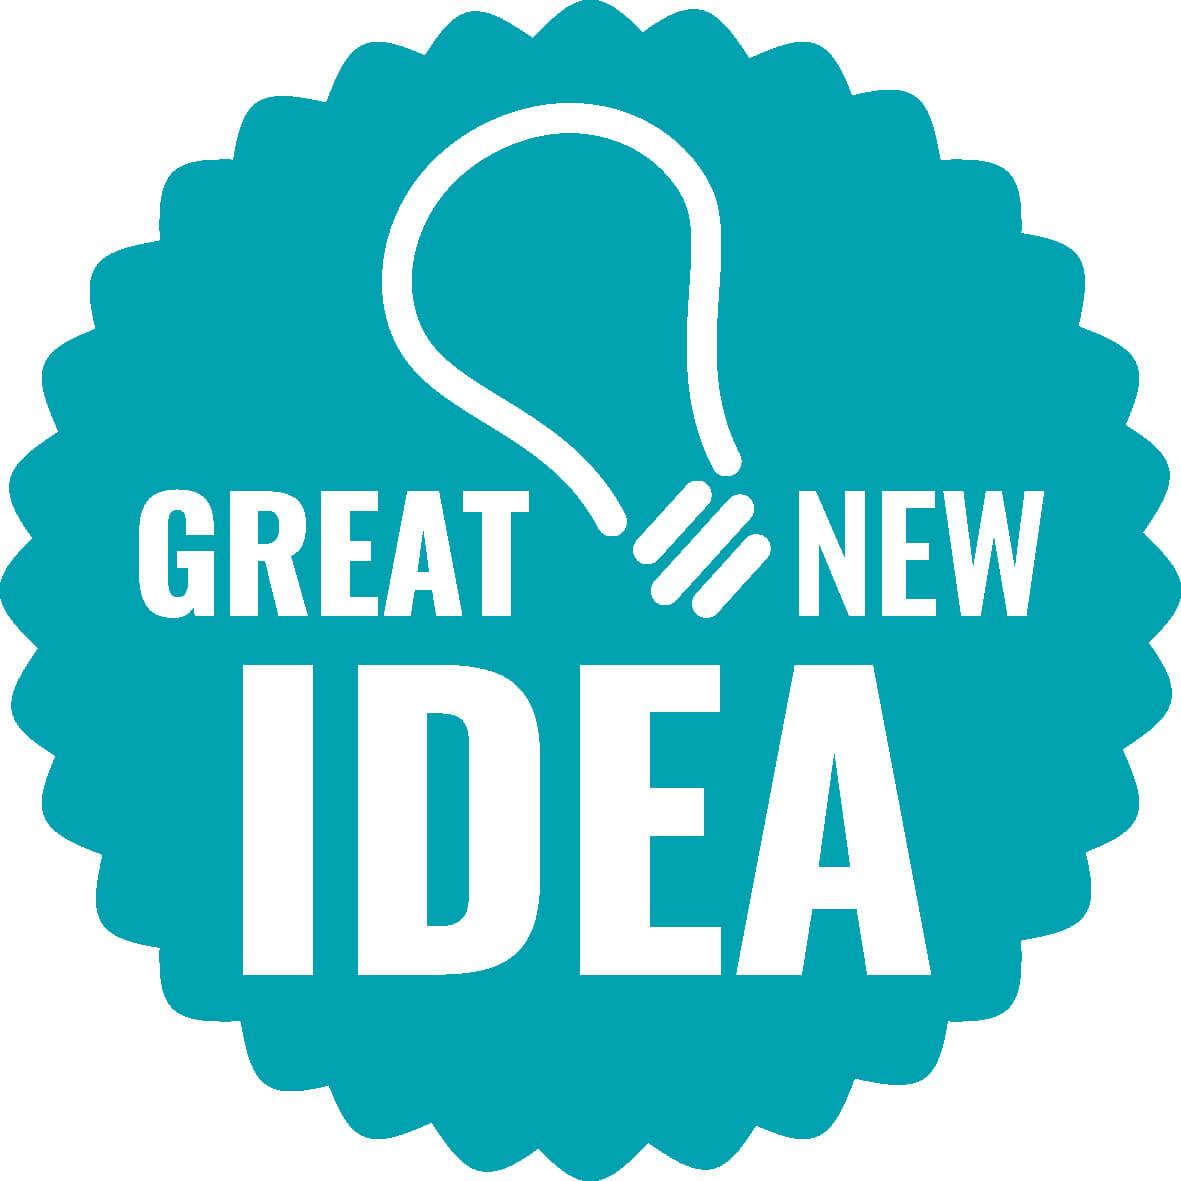 Foodex 2020 2018 great new idea for New idea images